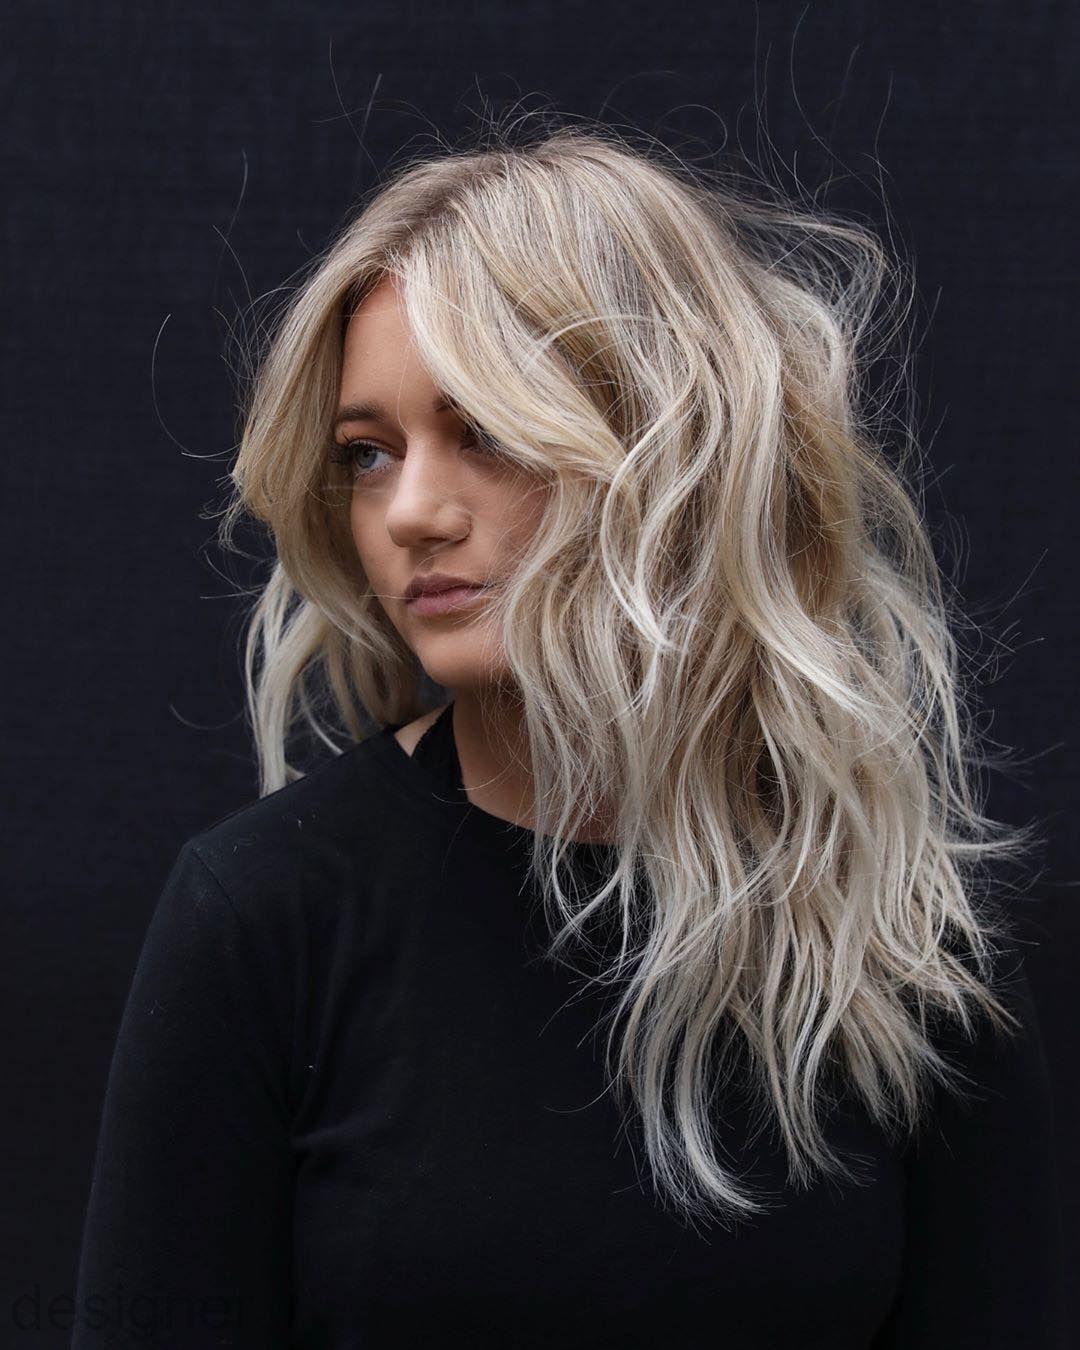 Hair Styles For Short Hair For Women Over 50 Round Faces Best Hair Styles For Turkey Neck Short T In 2020 Long Shag Haircut Damp Hair Styles Long Hair Styles